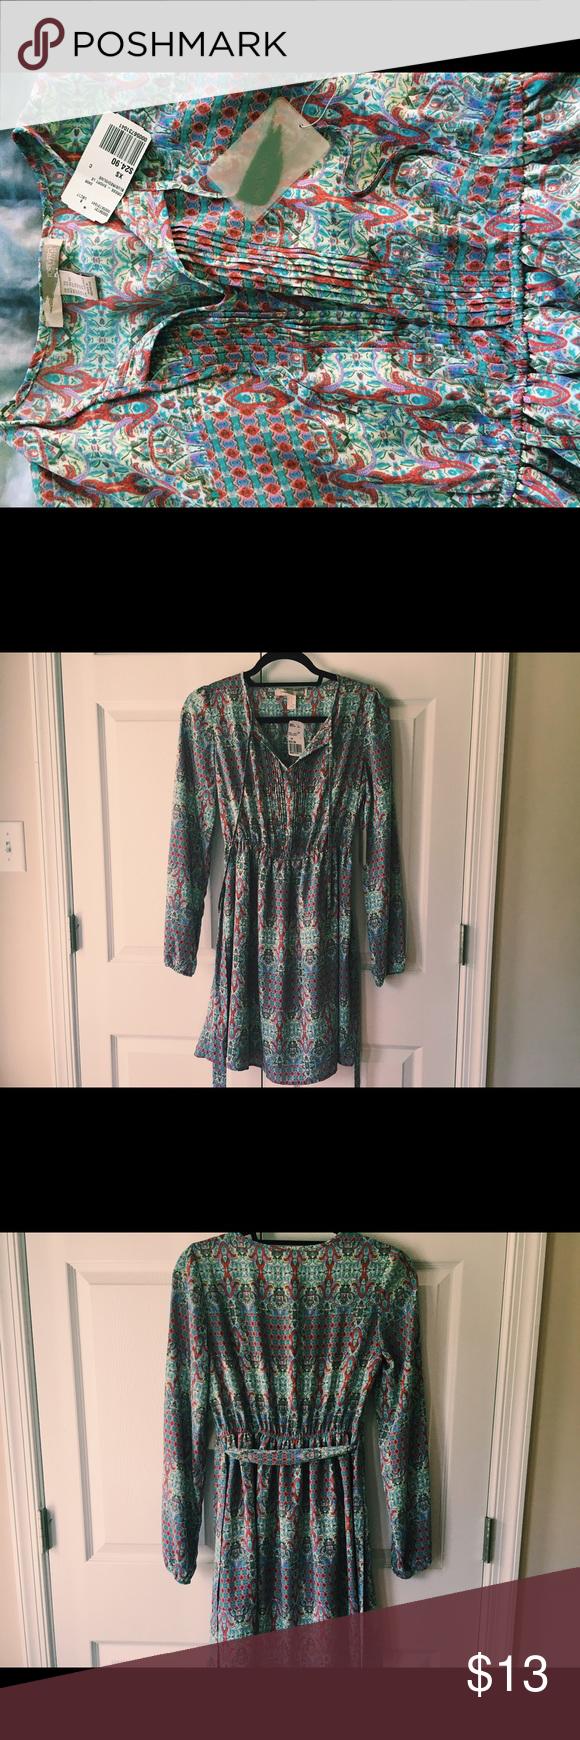 Forever 21 NWT dress NWT Long sleeved sheer forever 21 dress, ties in the front Forever 21 Dresses Long Sleeve